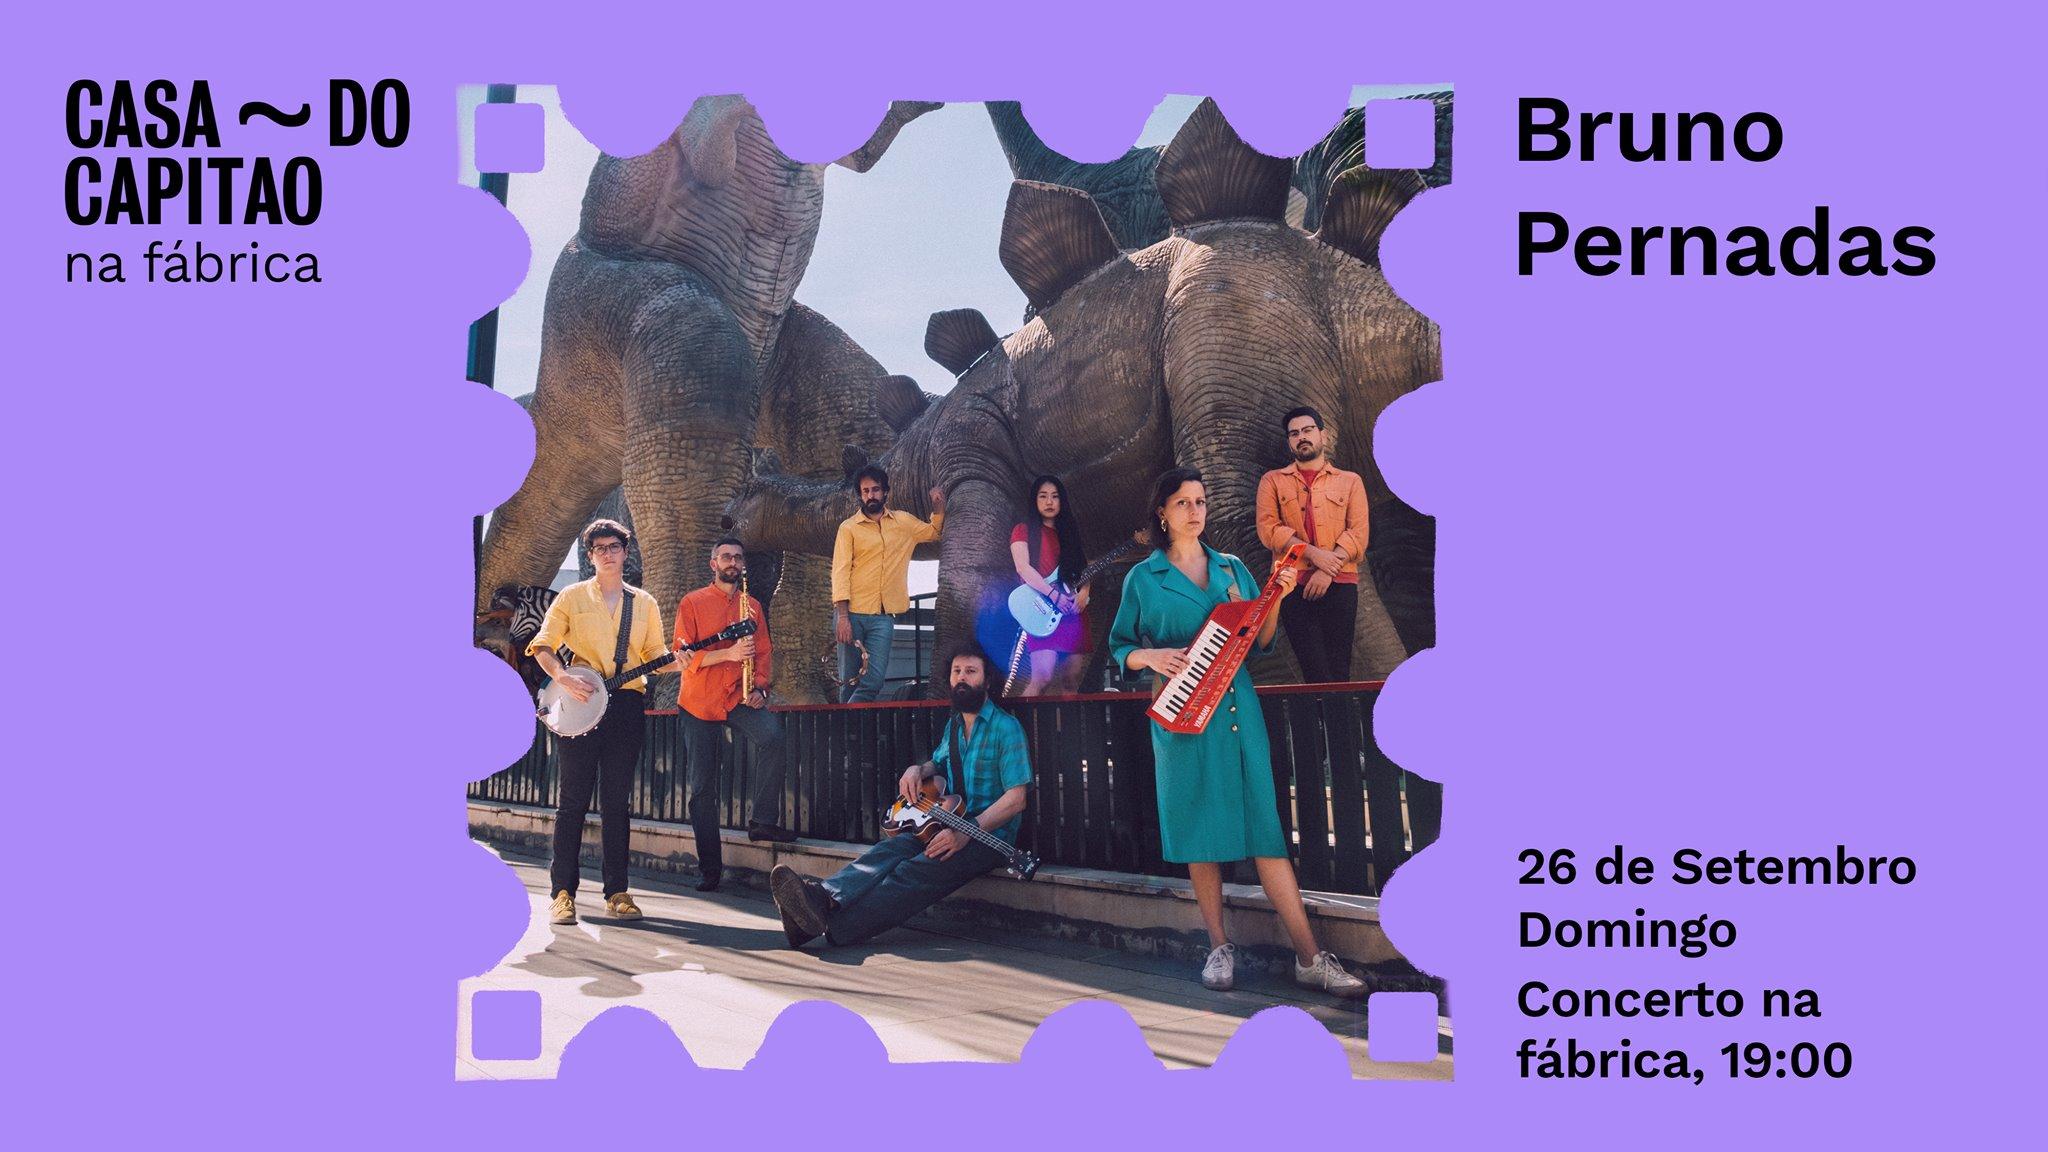 Bruno Pernadas • Concerto na fábrica